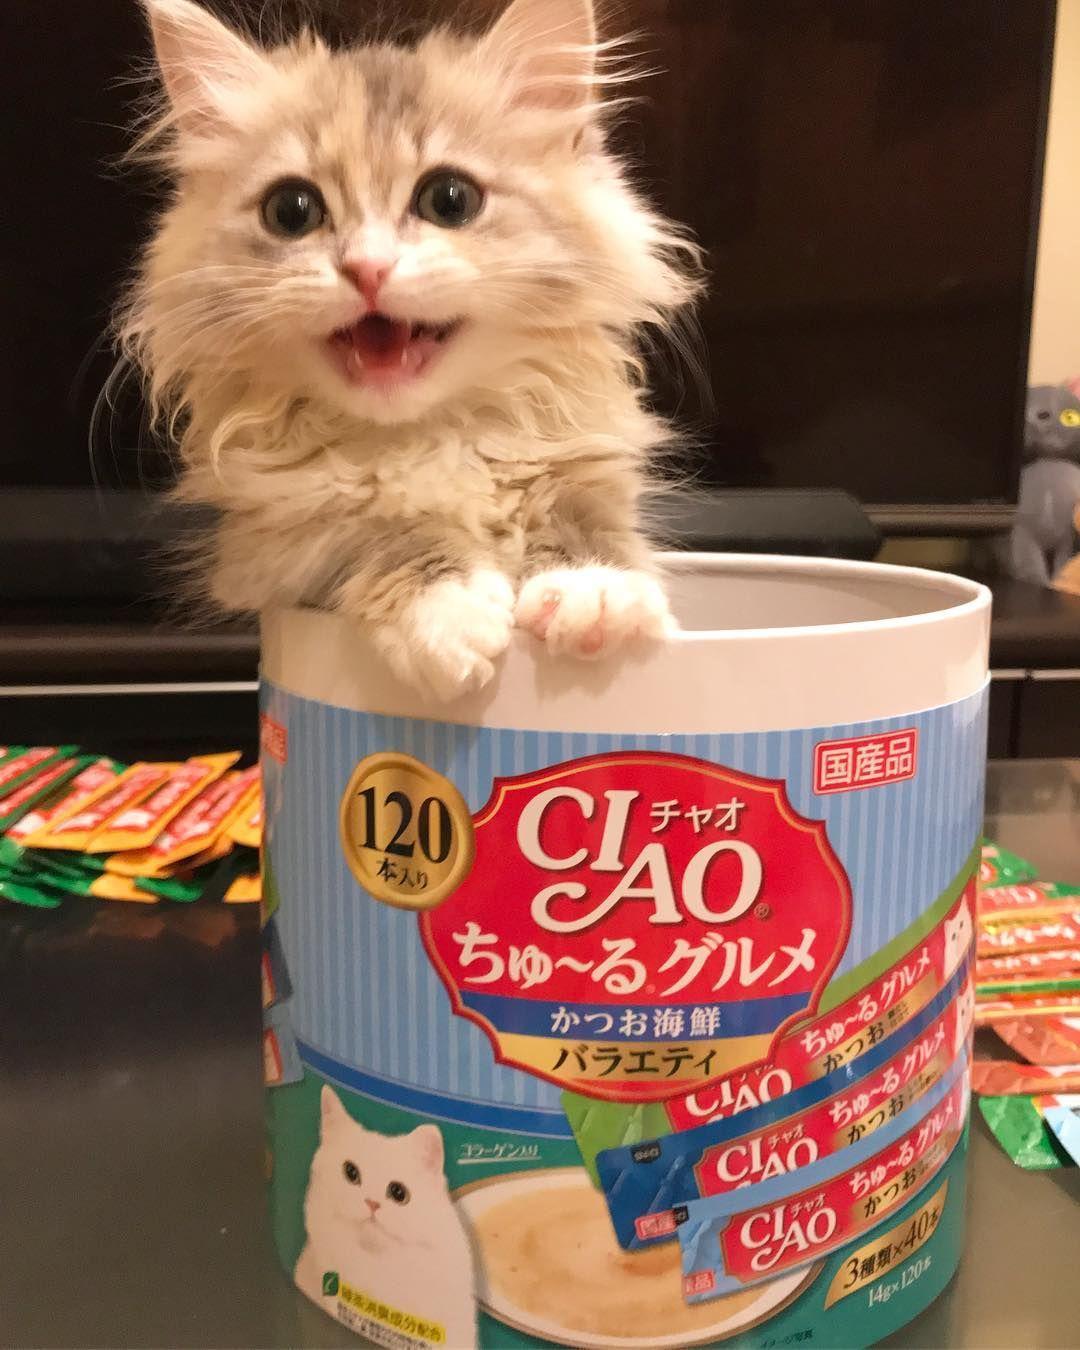 View chan♡ @c_chan_chan Instagram Photo パラダイス〜〜🤗🤗🤗 . ちゅーる 大人買い💕  アイリはまだ食べられないけど🤣 . . アイリ/2ヶ月/マンチカンダイリュート